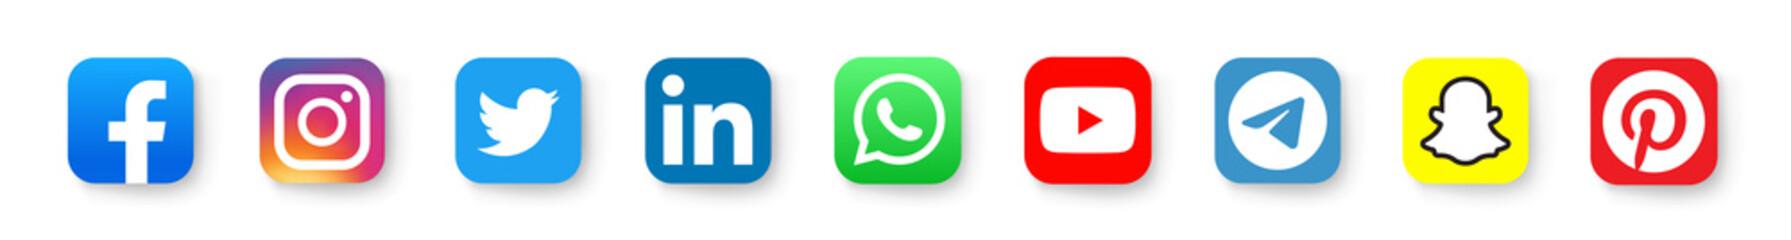 Realistic social media logotype collection: Facebook, instagram, twitter, youtube, linkedin, snapchat, telegram, pinterest, whatsap, periscope, vimeo. Social media icons. - stock vector editorial.